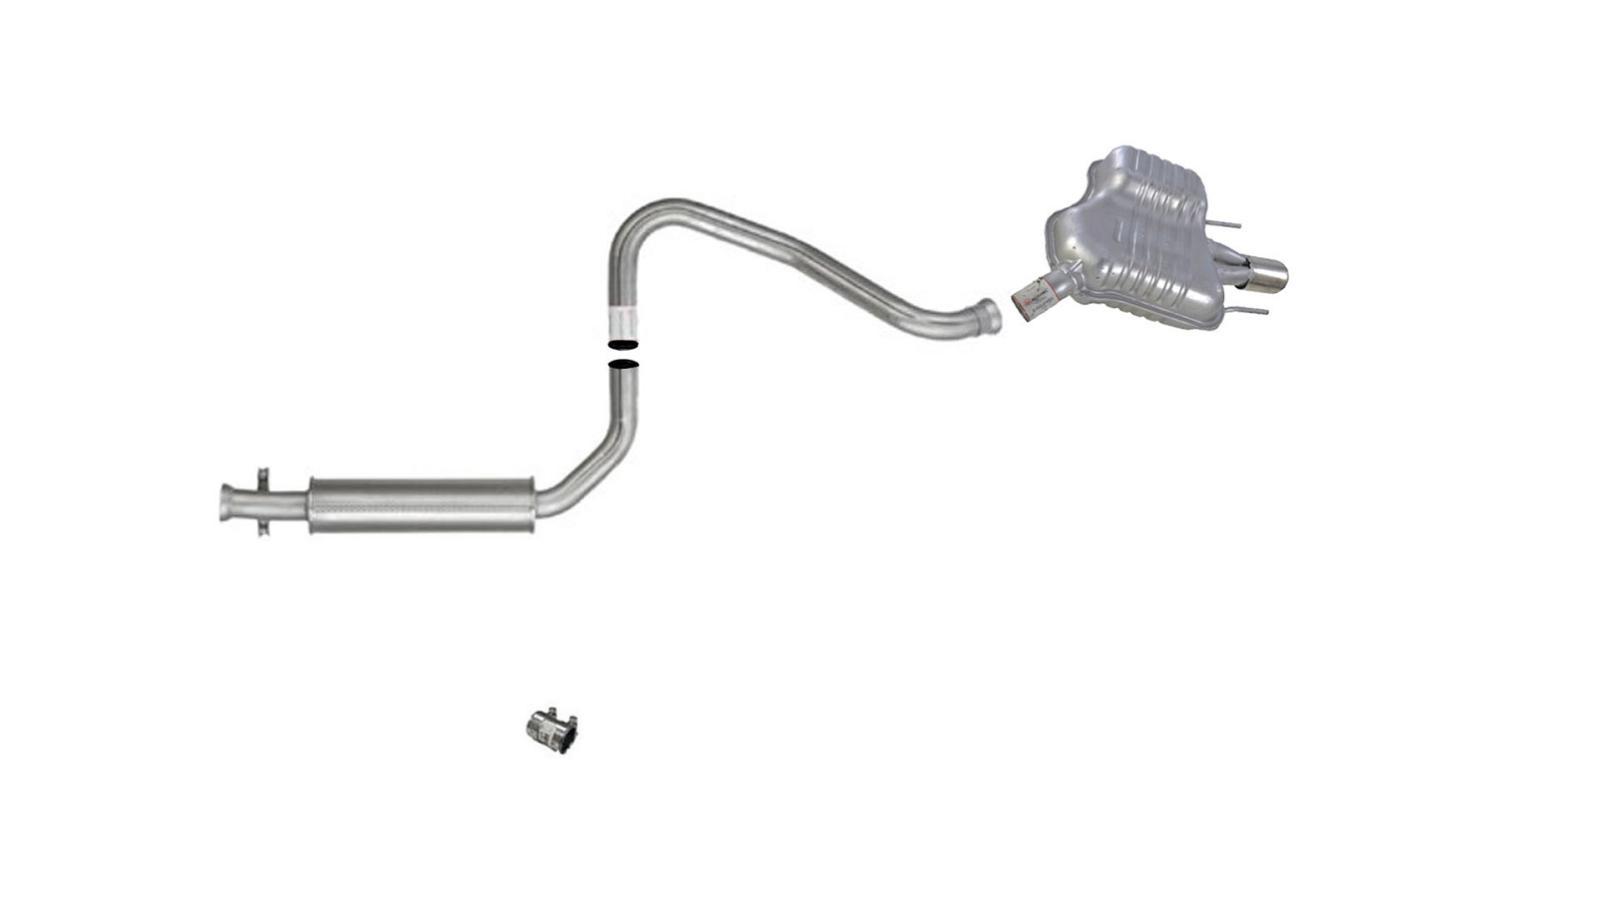 Auto Brand Muffler Exhaust Pipe System